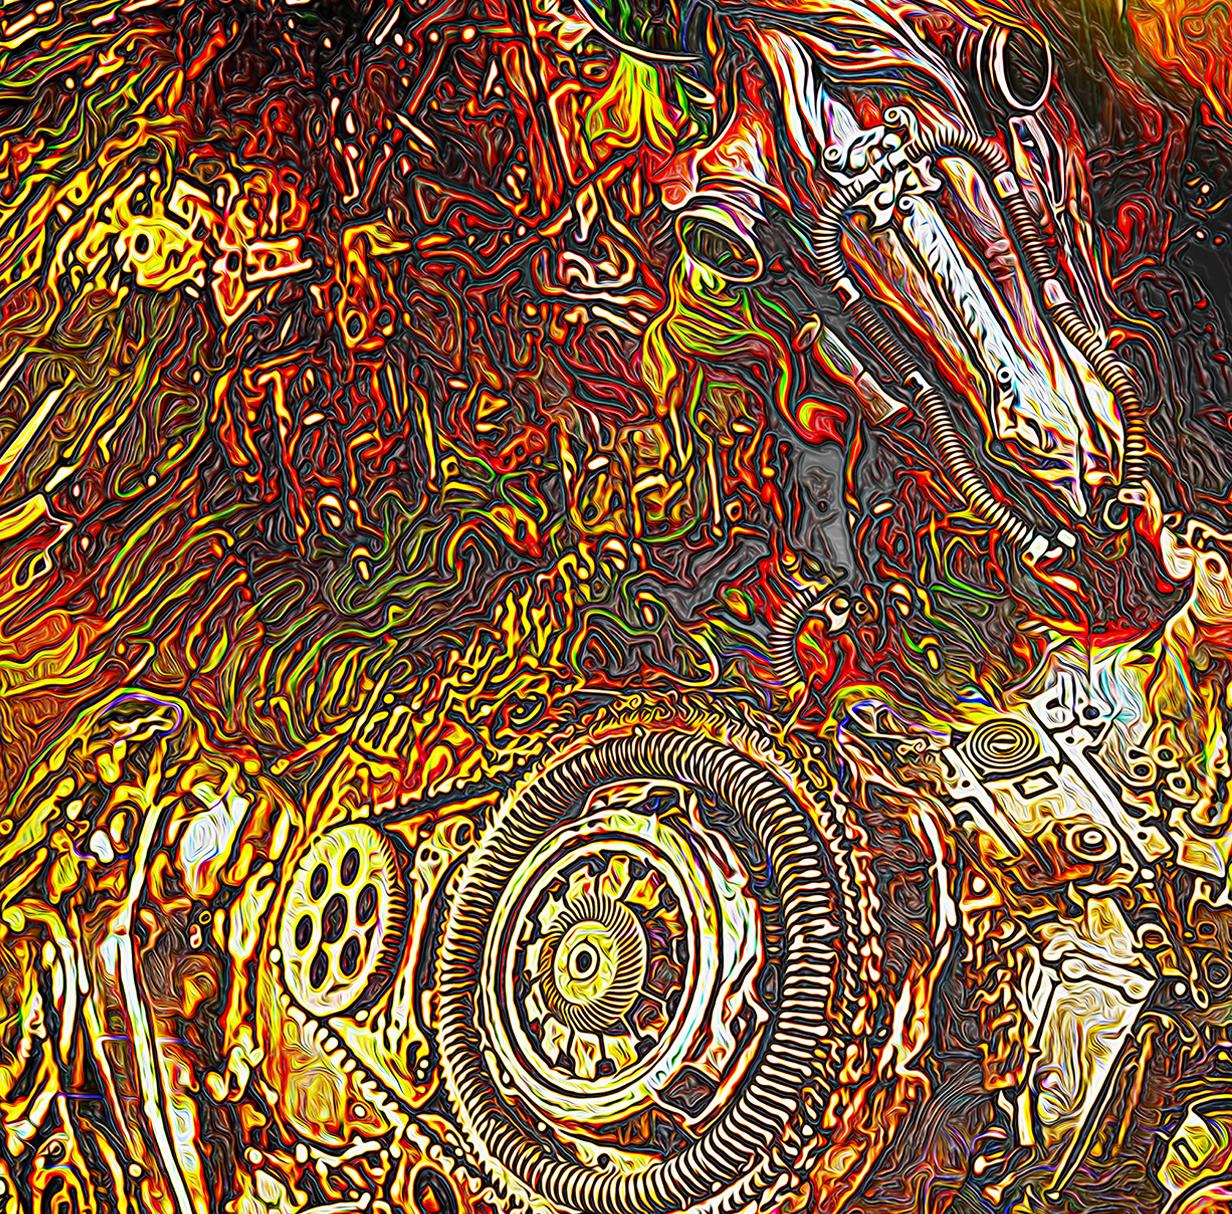 Golden Pegasus by Gordon Coldwell